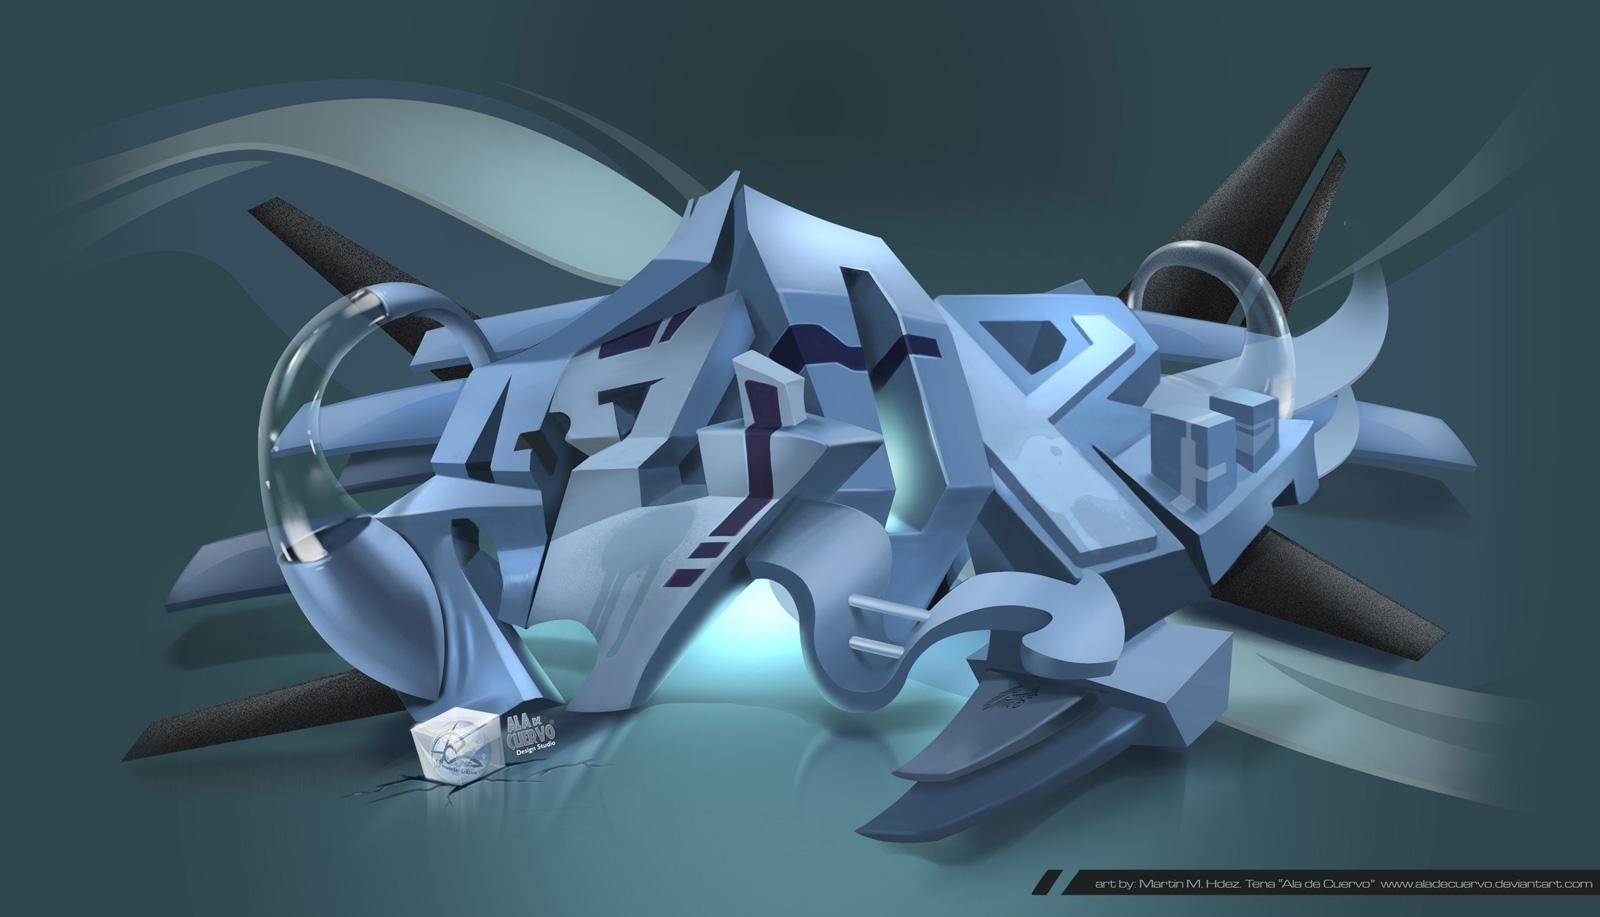 AZOR graffiti style